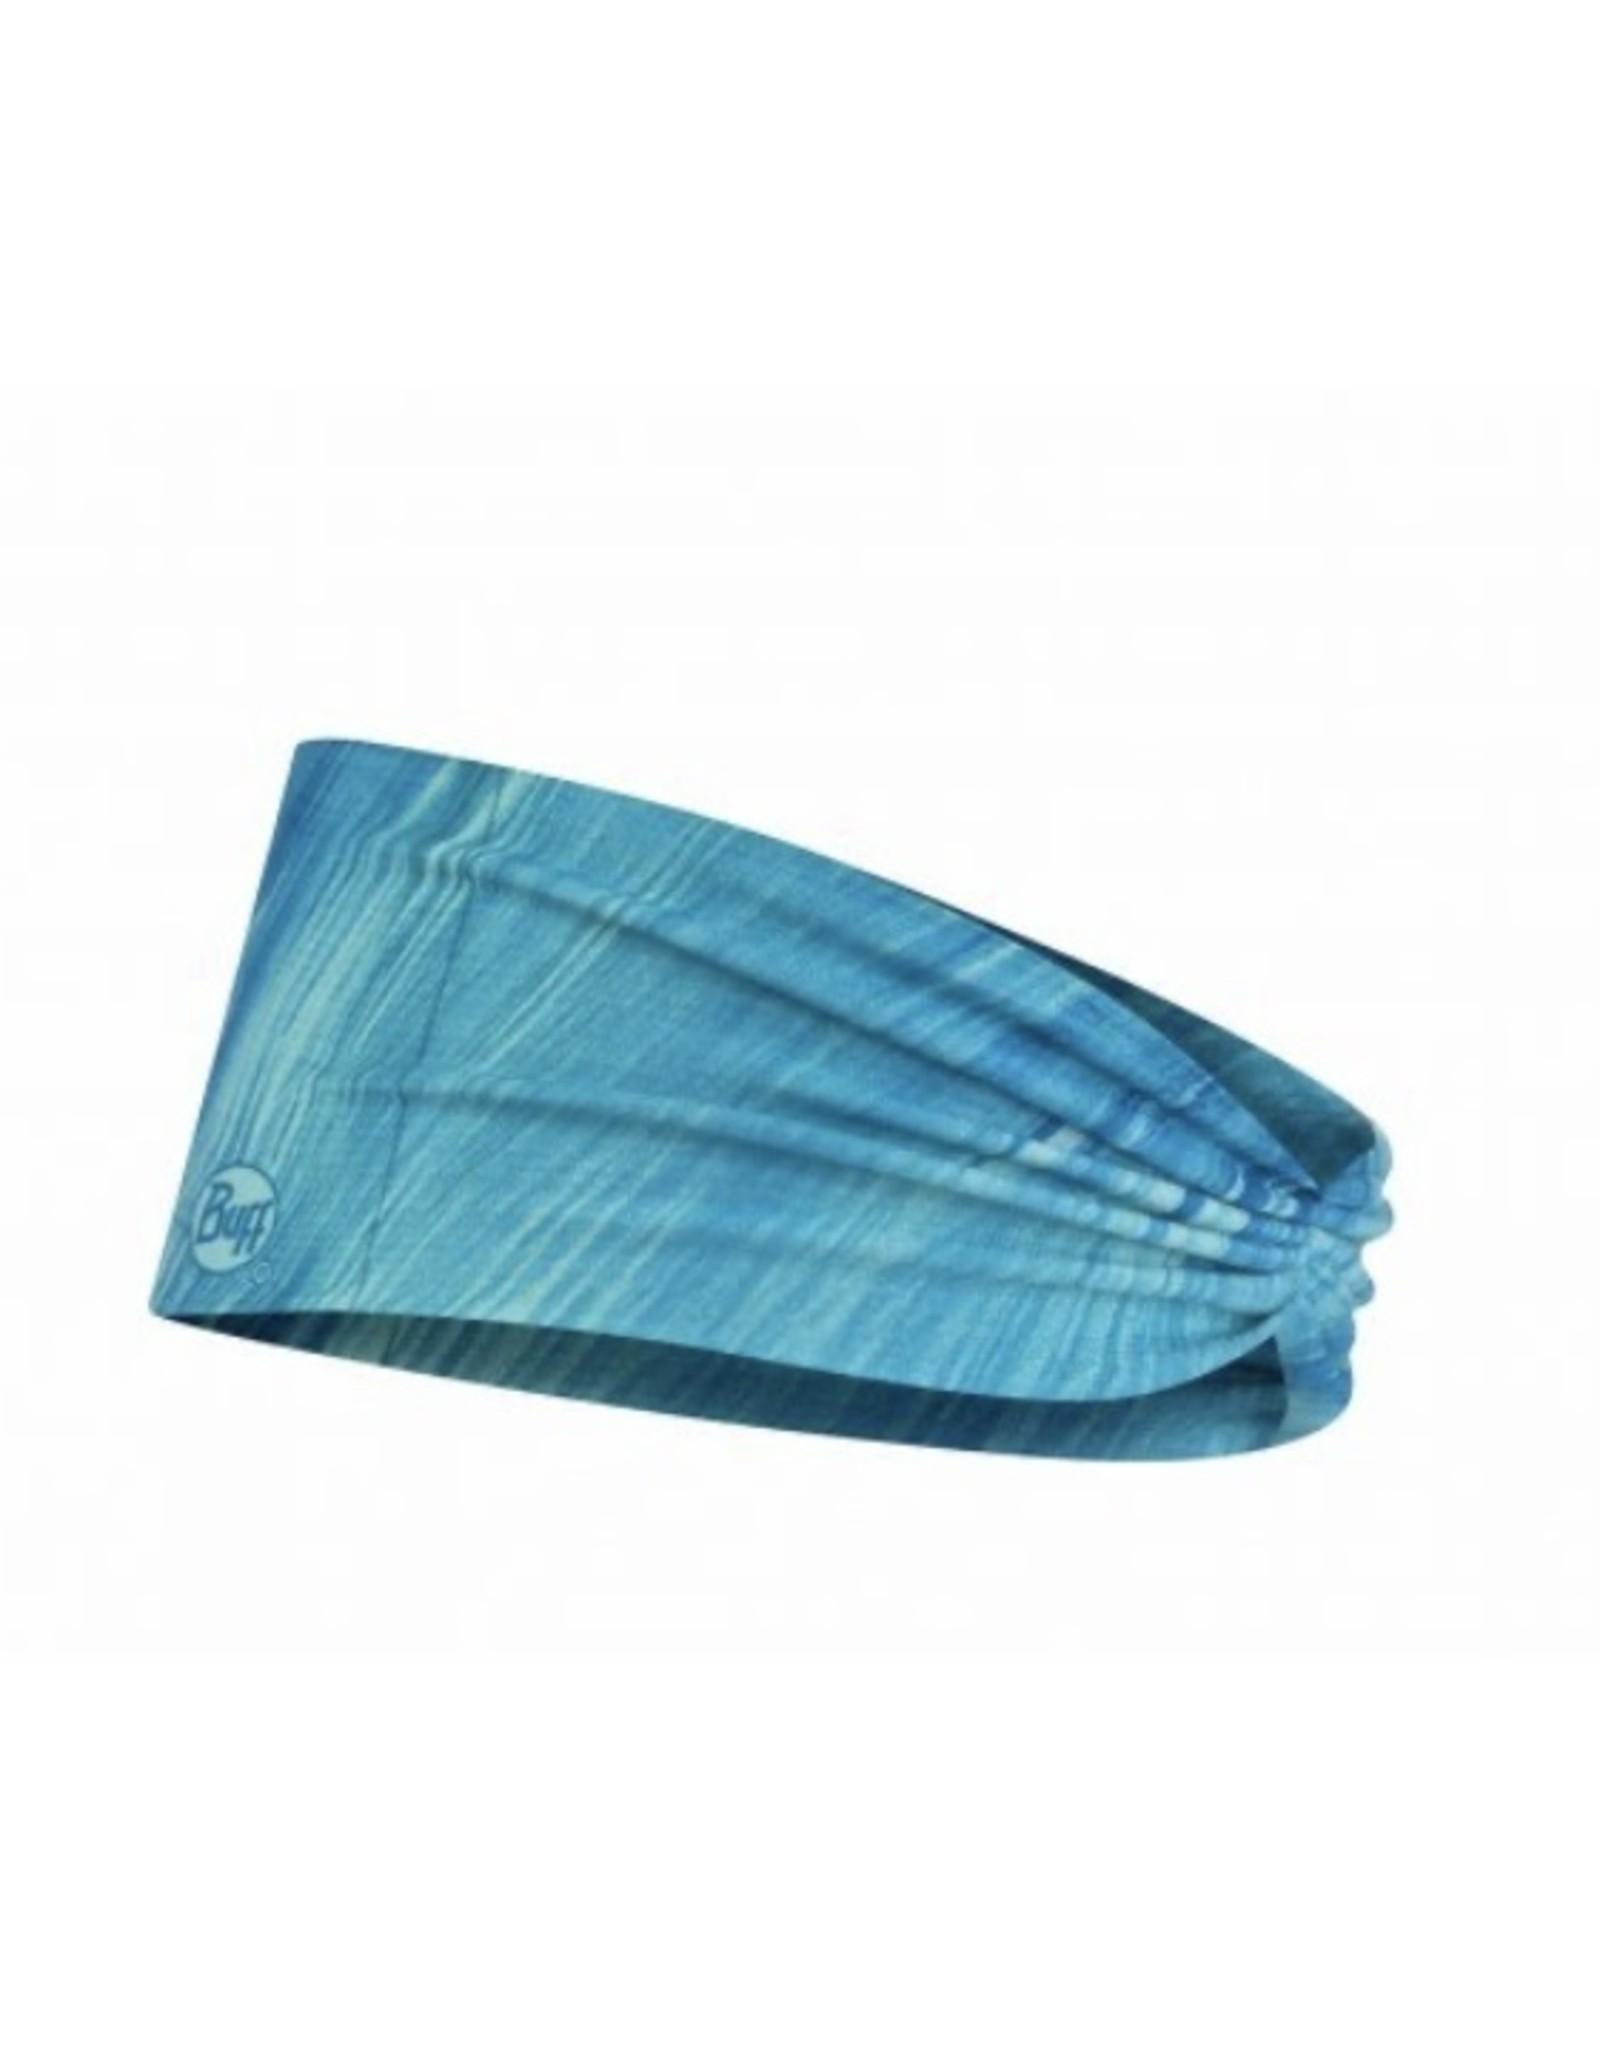 Buff Buff CoolNet UV+ Tapered Headband Pixeline Turqoise